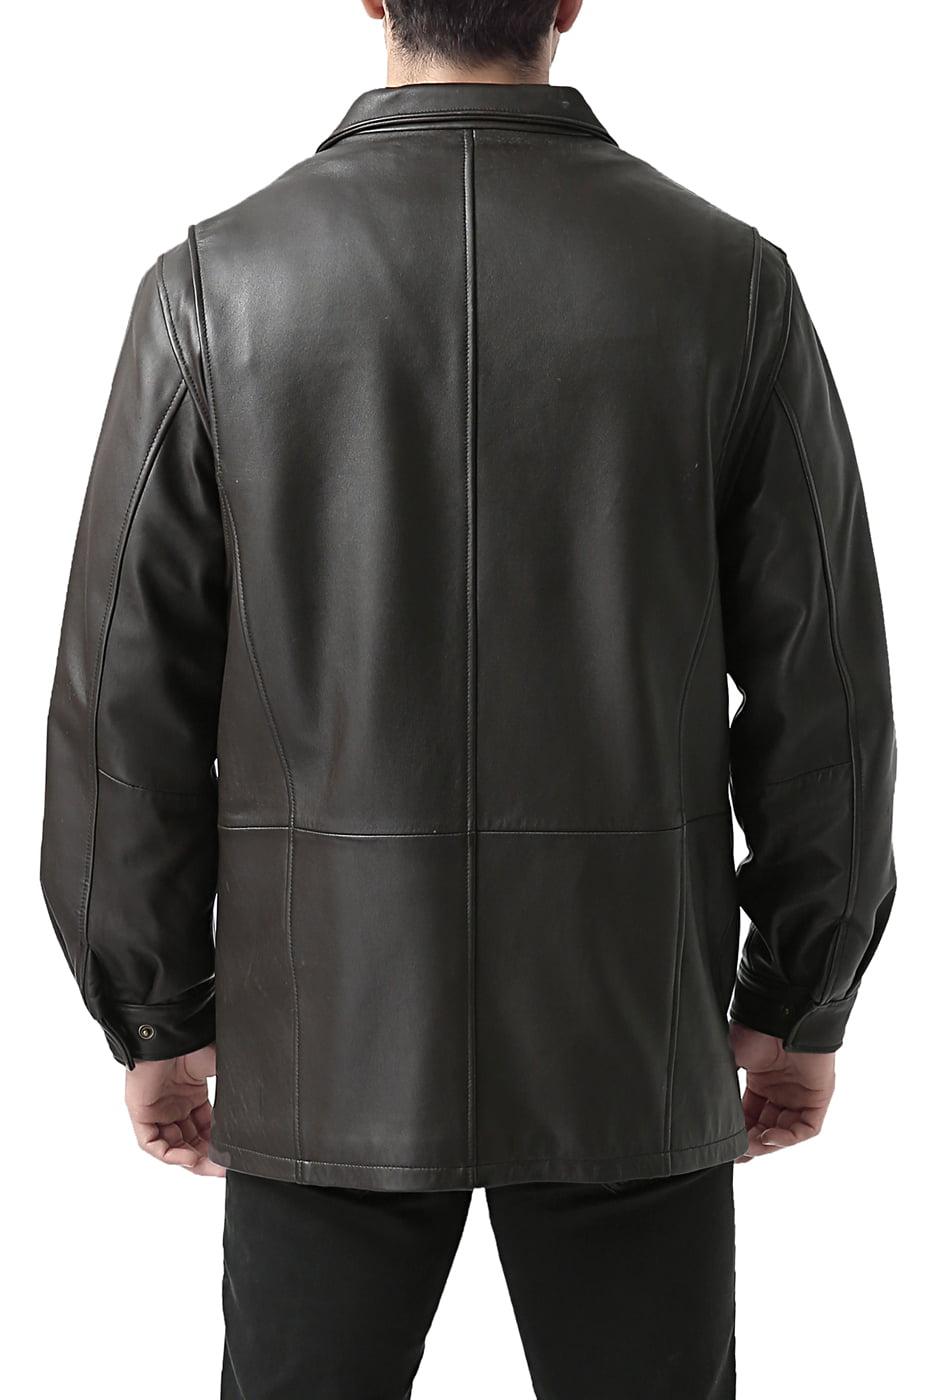 df9dc2cda87 Bgsd Men S Bryson Zealand Lambskin Leather Coat M Com. Bgsd Women S Kare New  Zealand